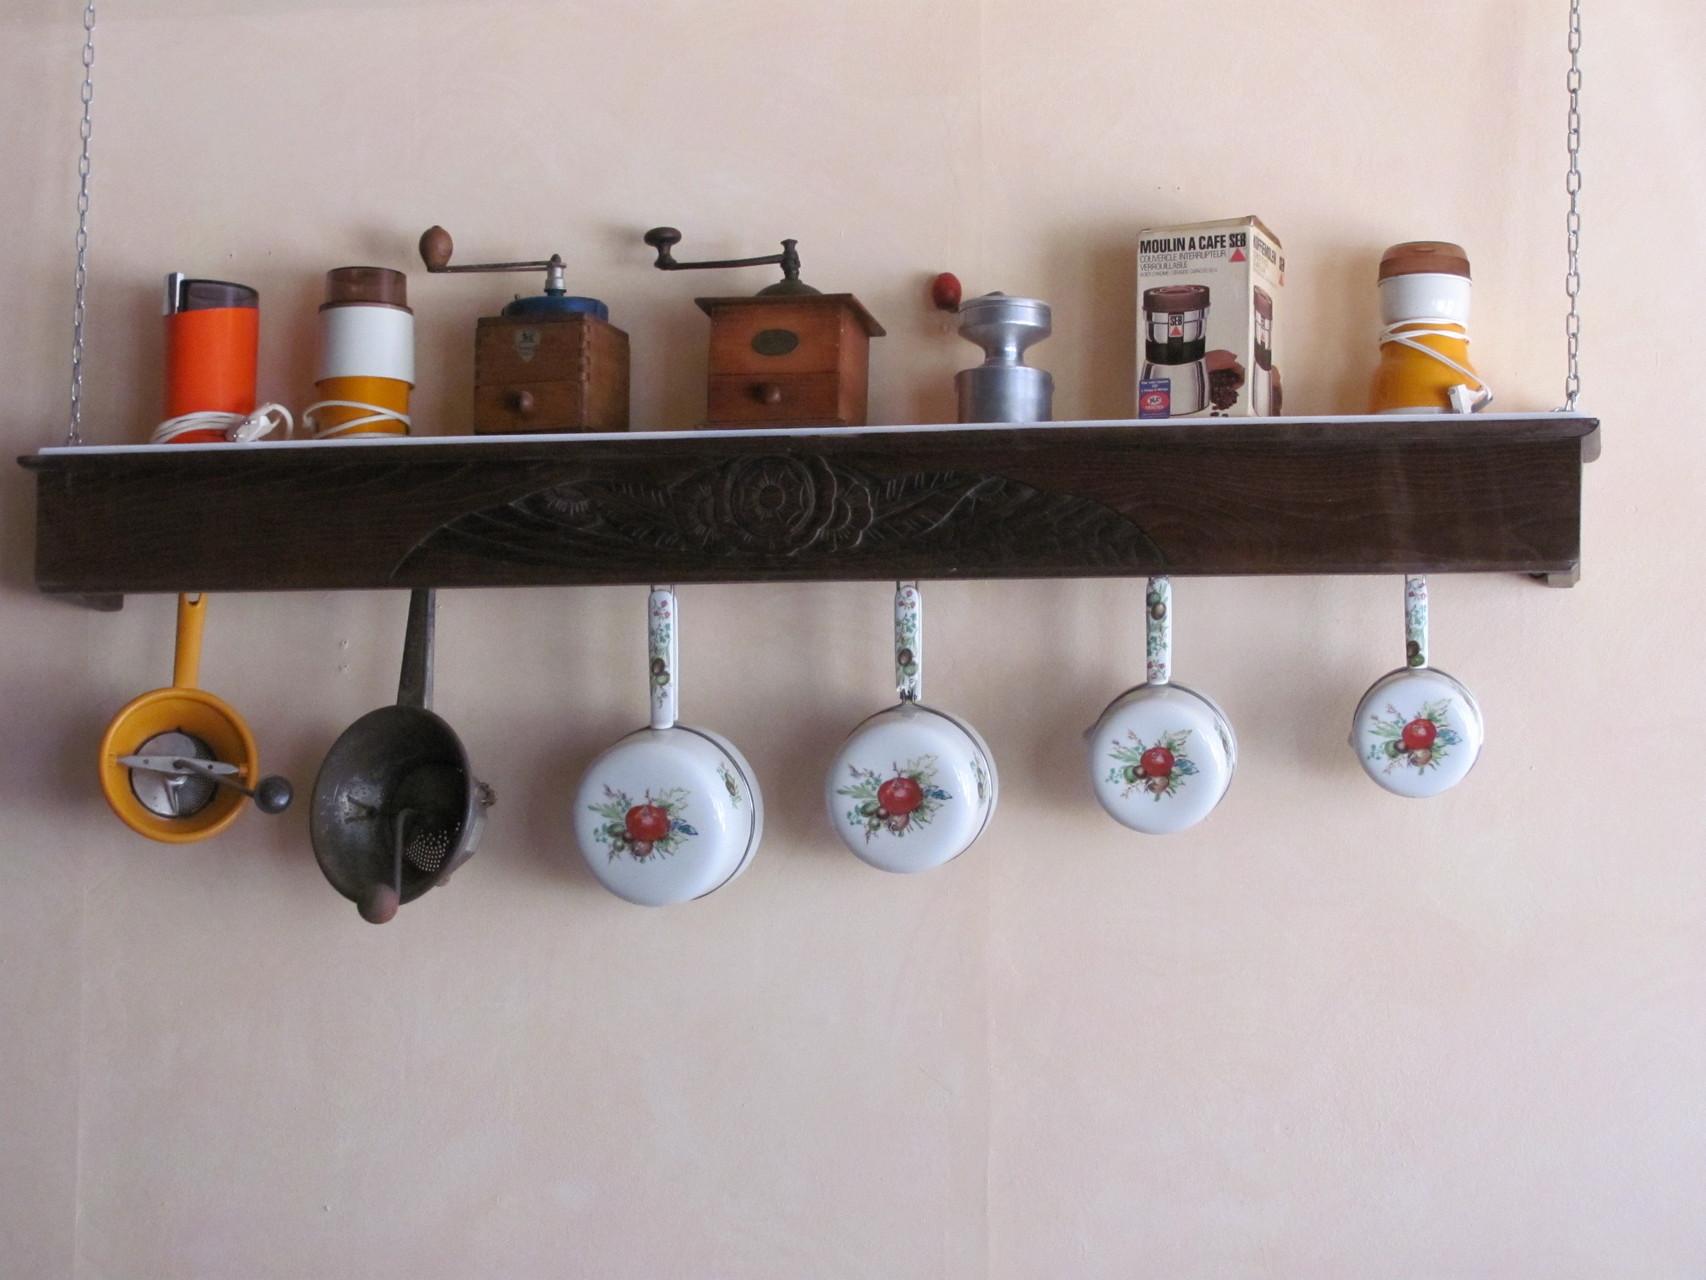 Ustensil de cuisine au mur de la salle de restaurant